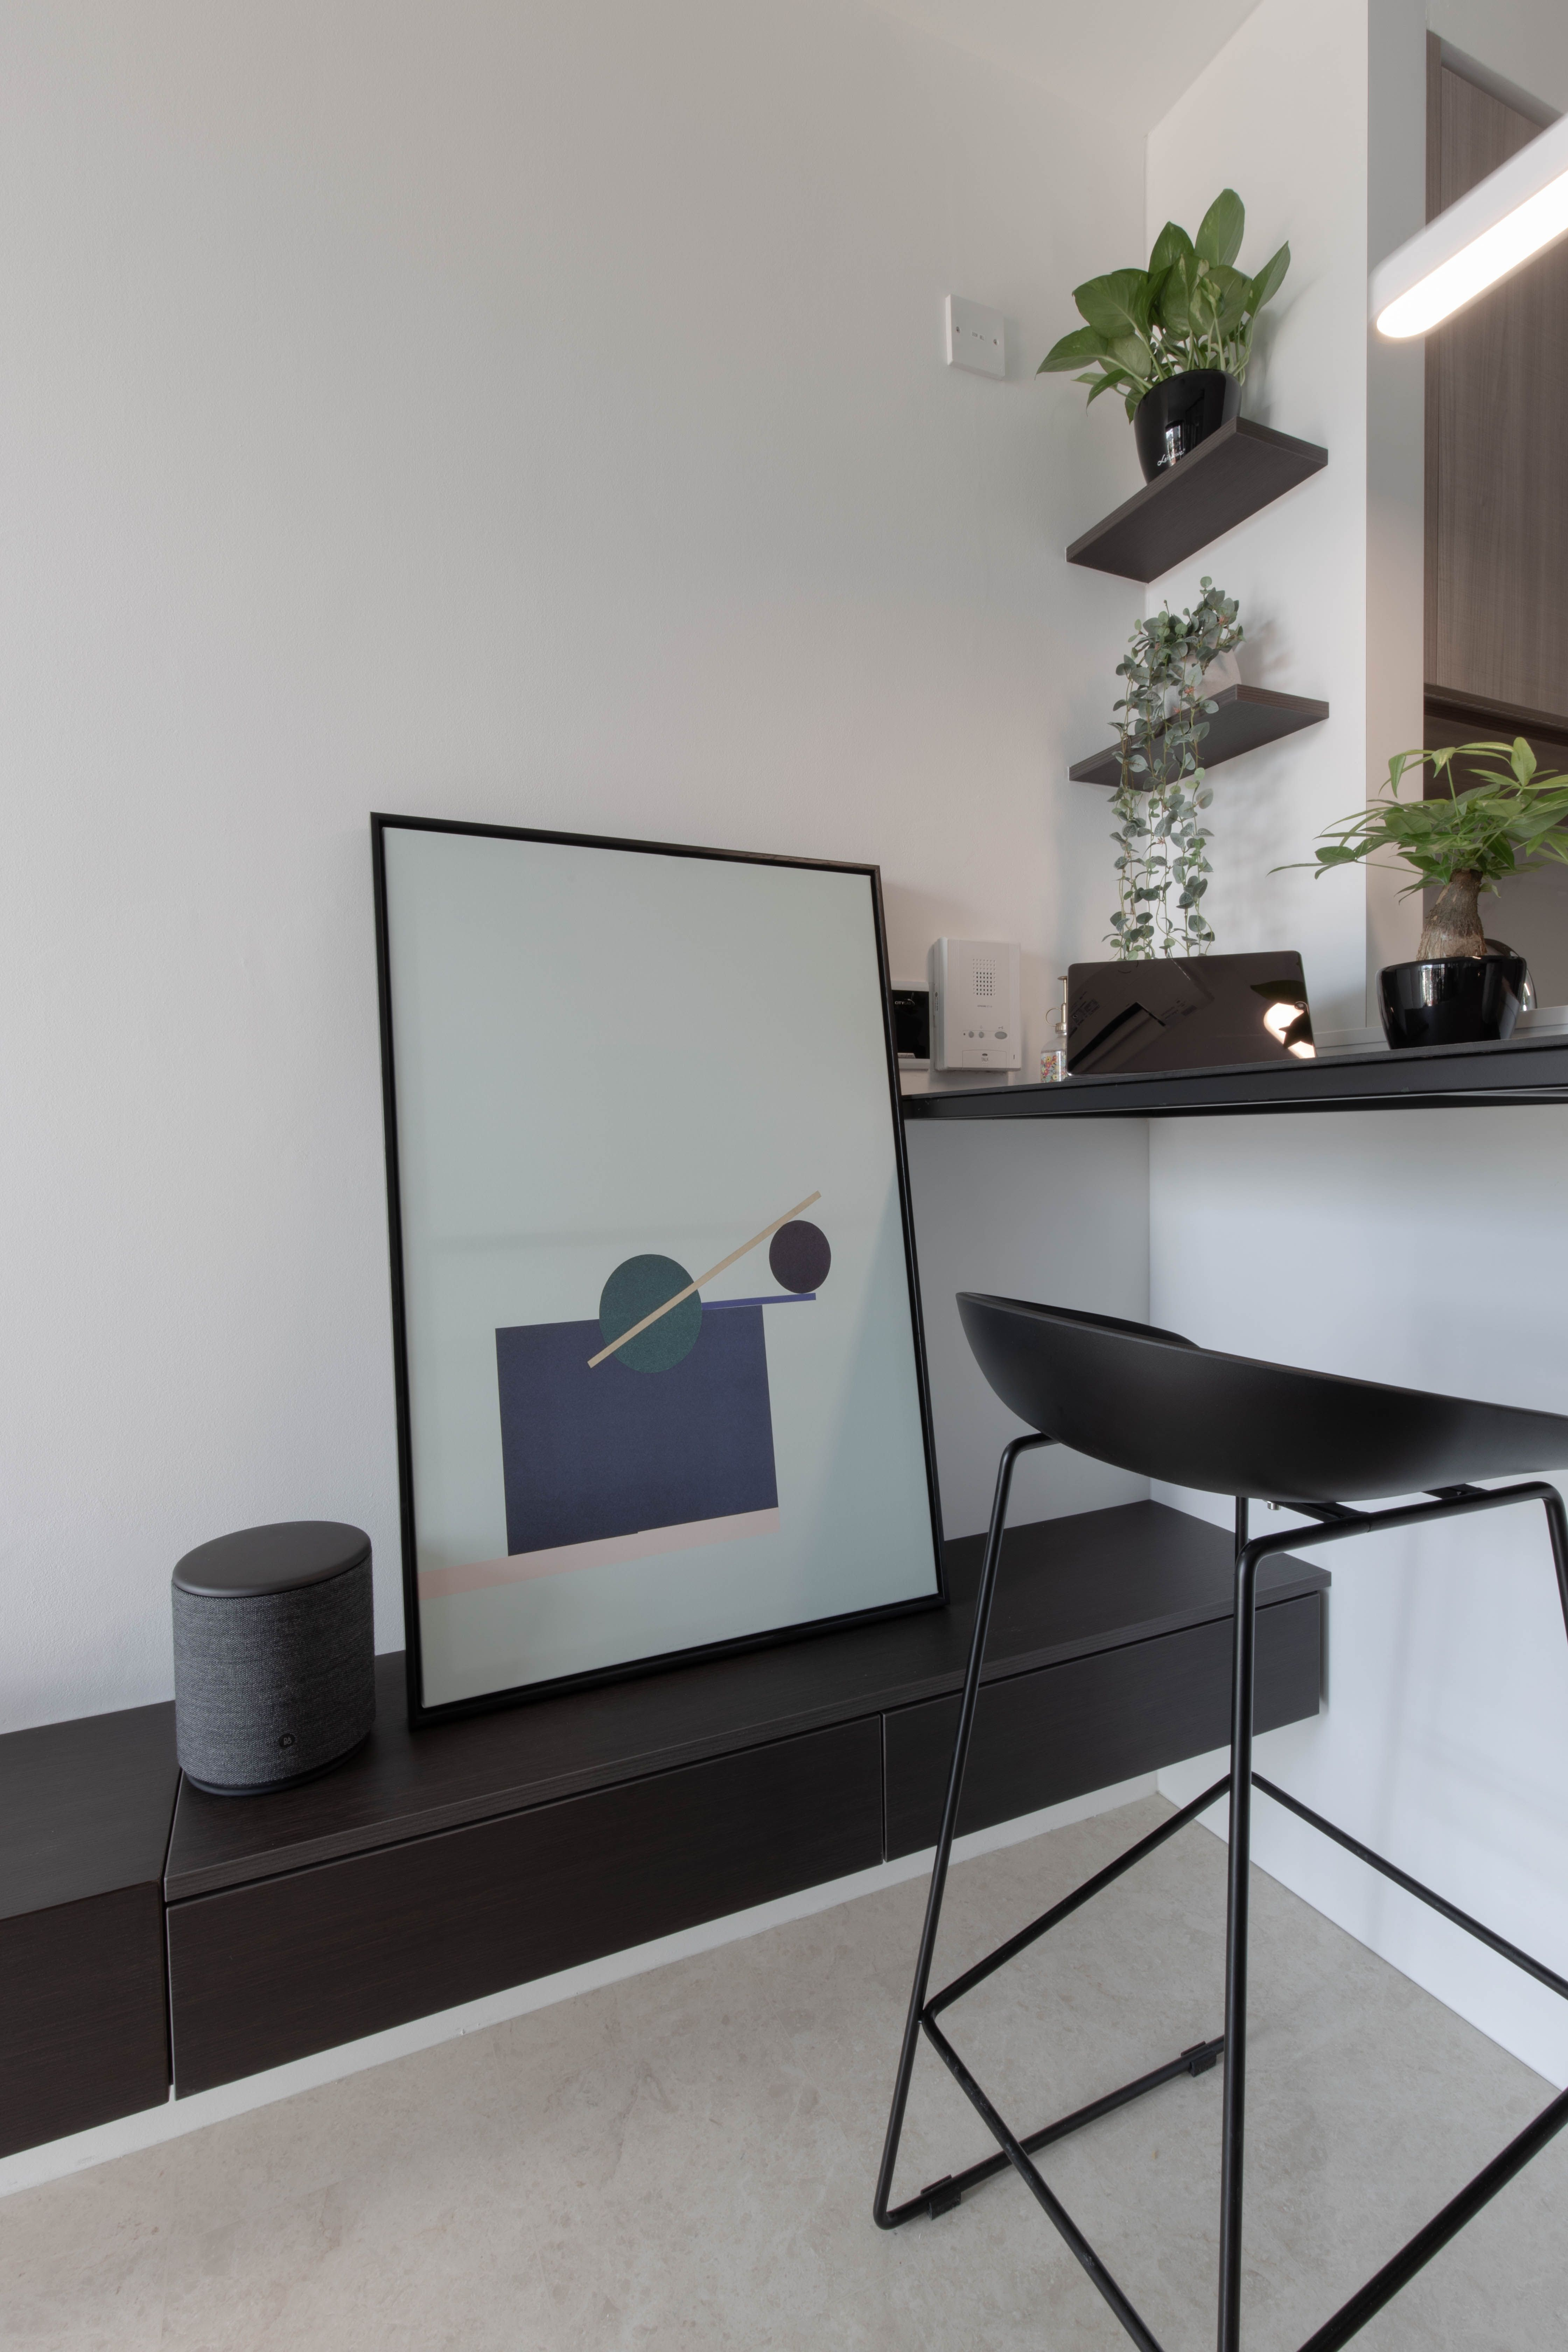 Minimalist interior design with monochromatic scheme in a ...